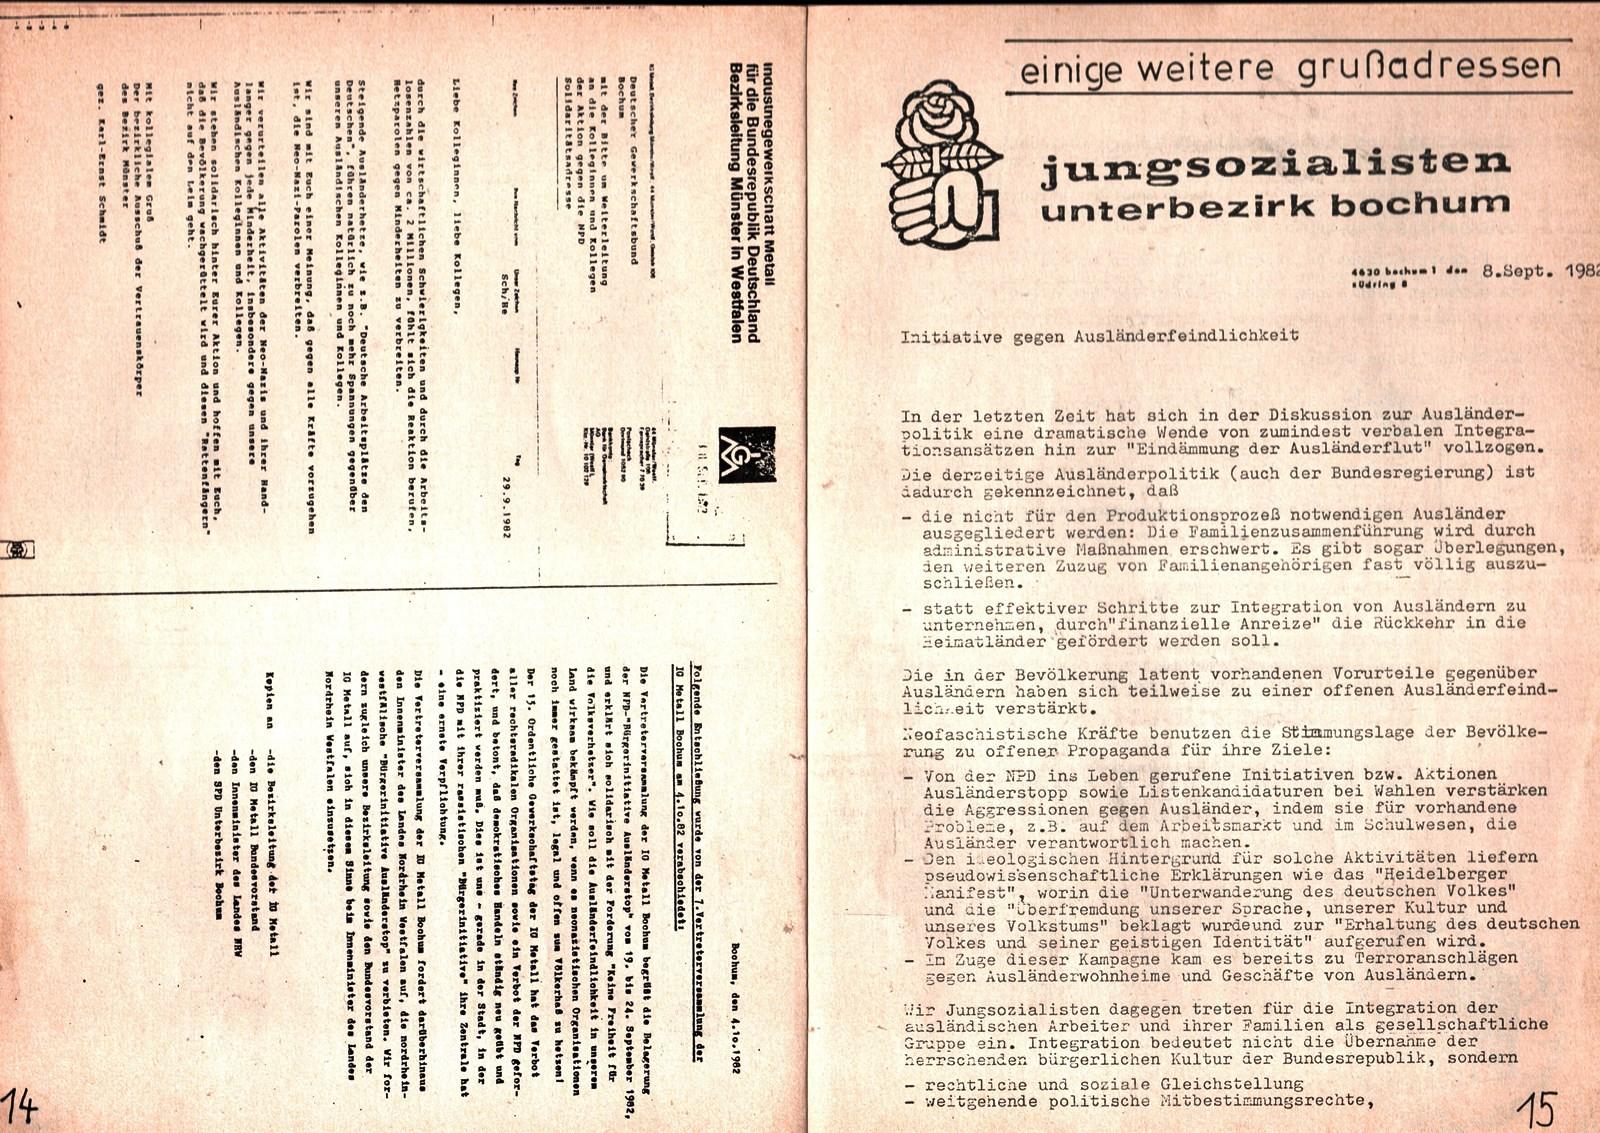 Bochum_1982_BI_Auslaenderstopp_belagern_010